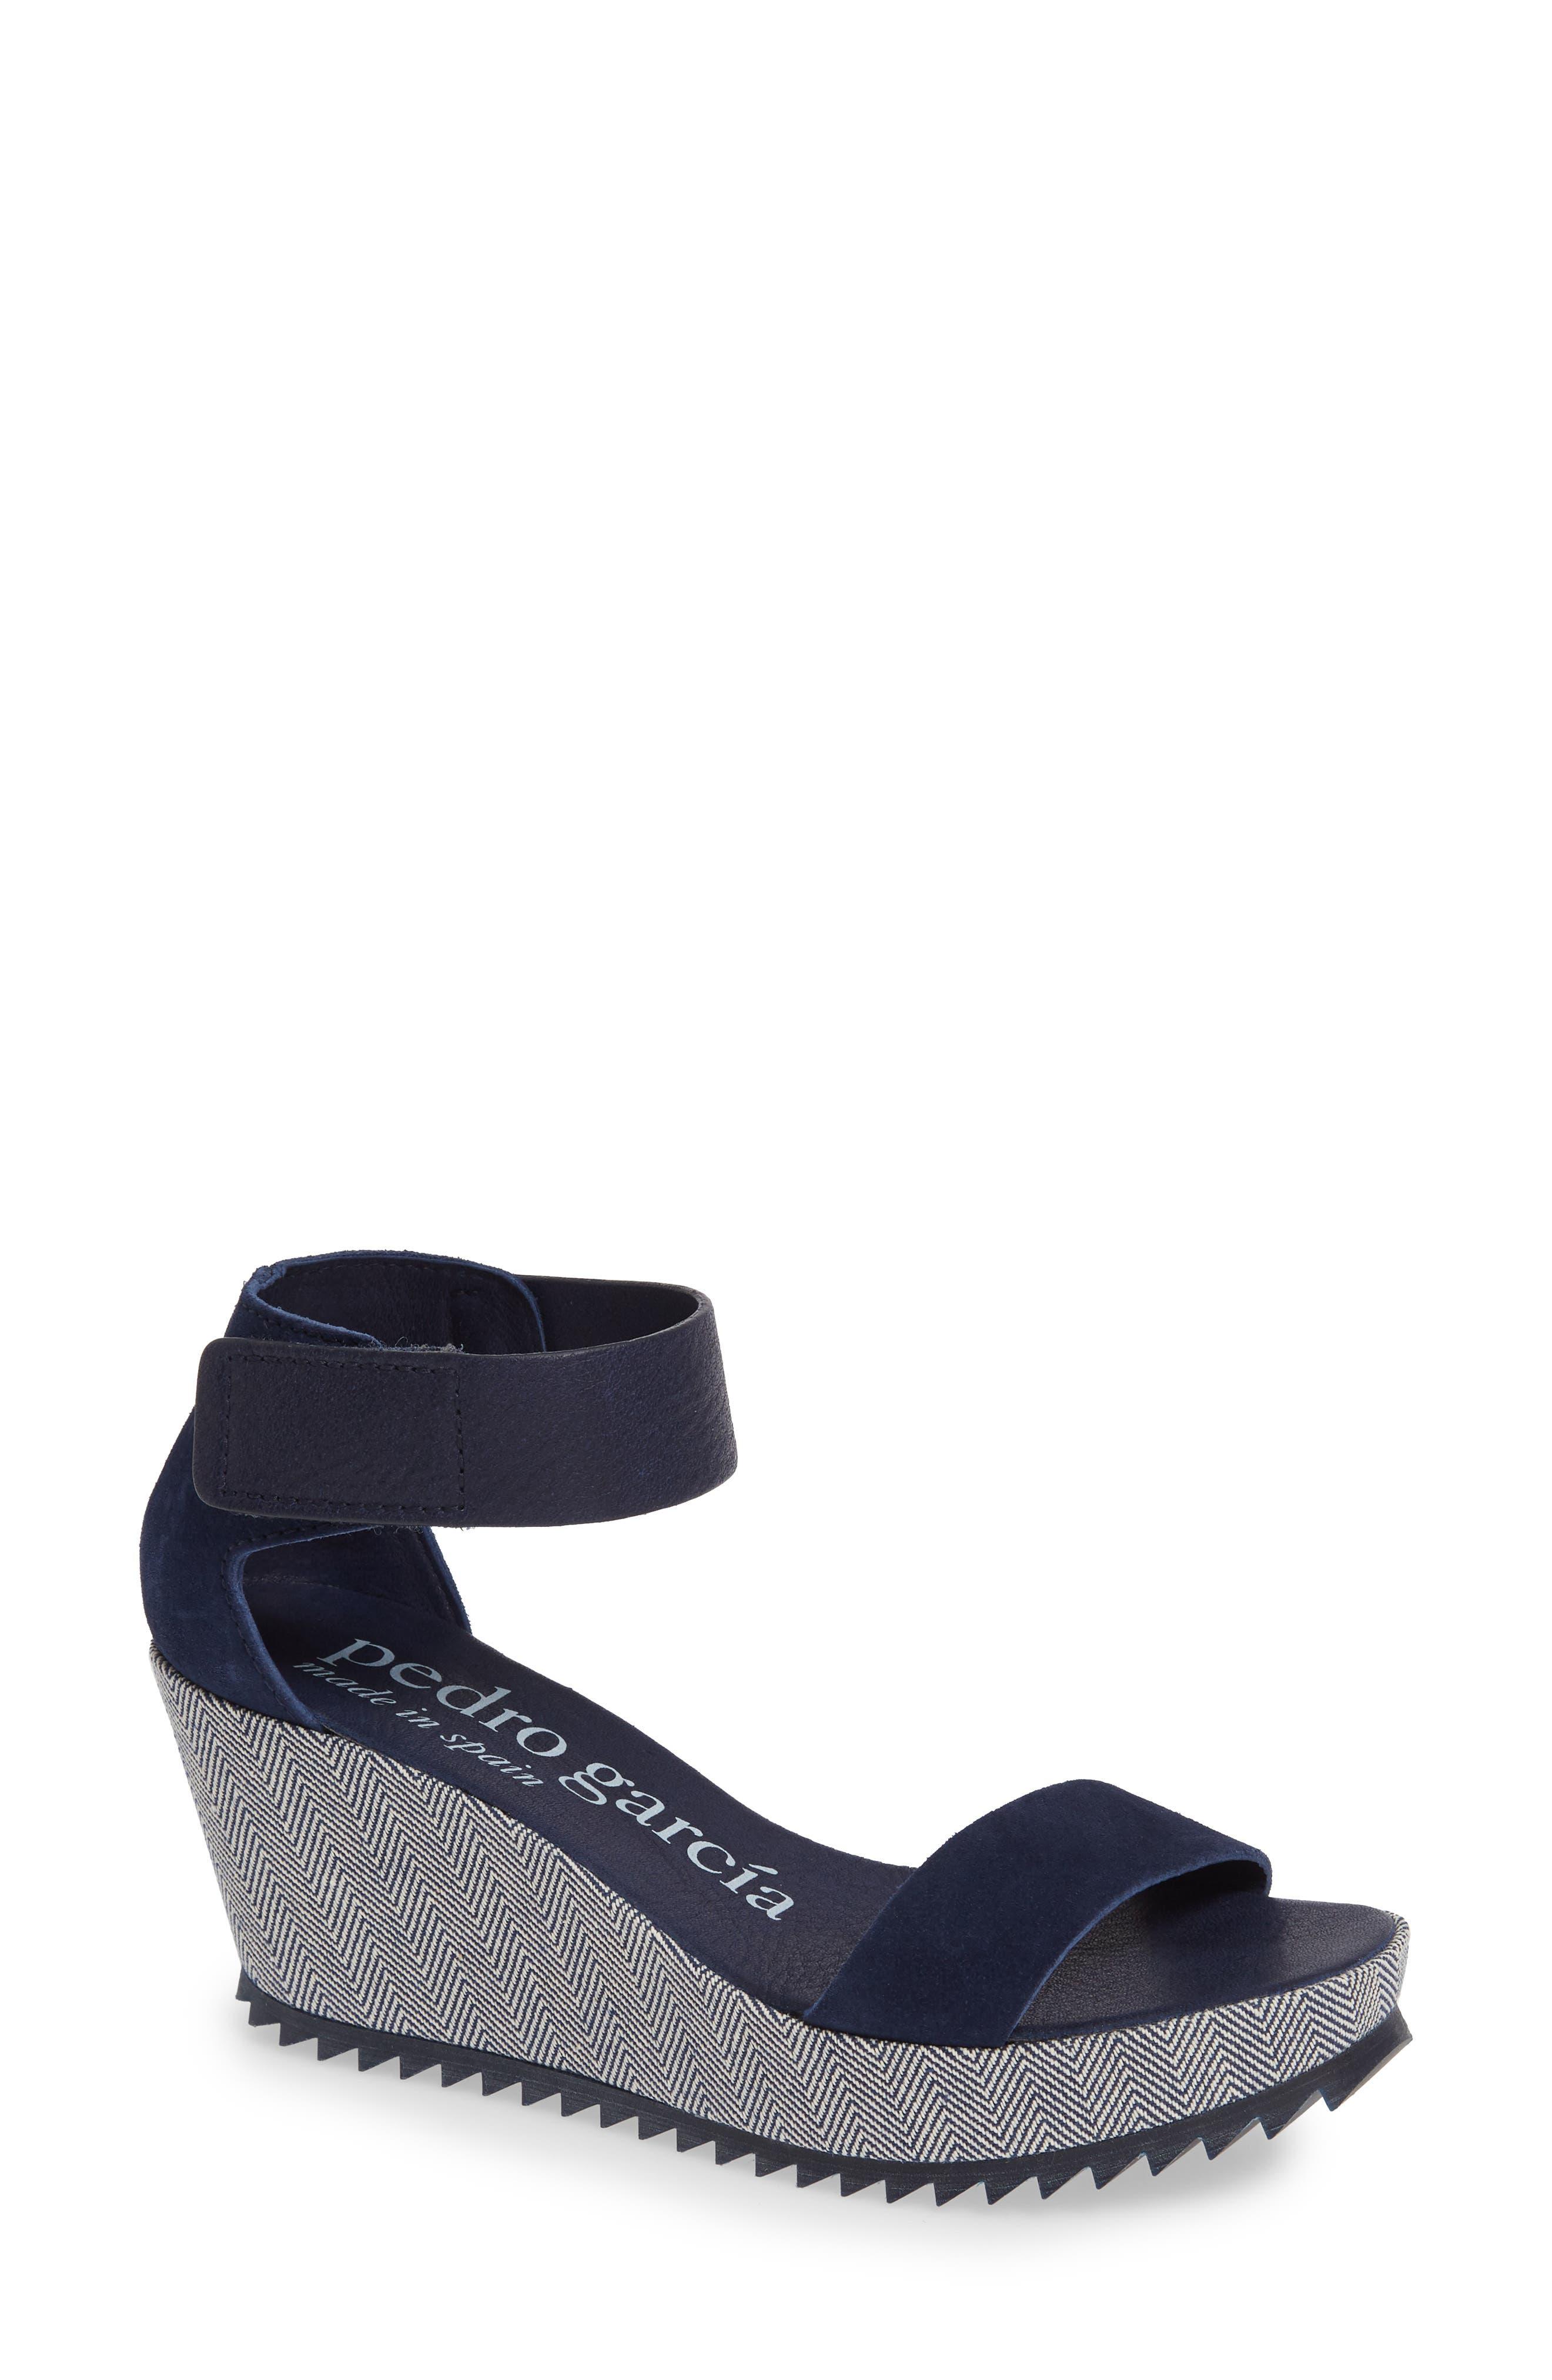 Fidelia Wedge Sandal,                         Main,                         color, MARINA CASTORO